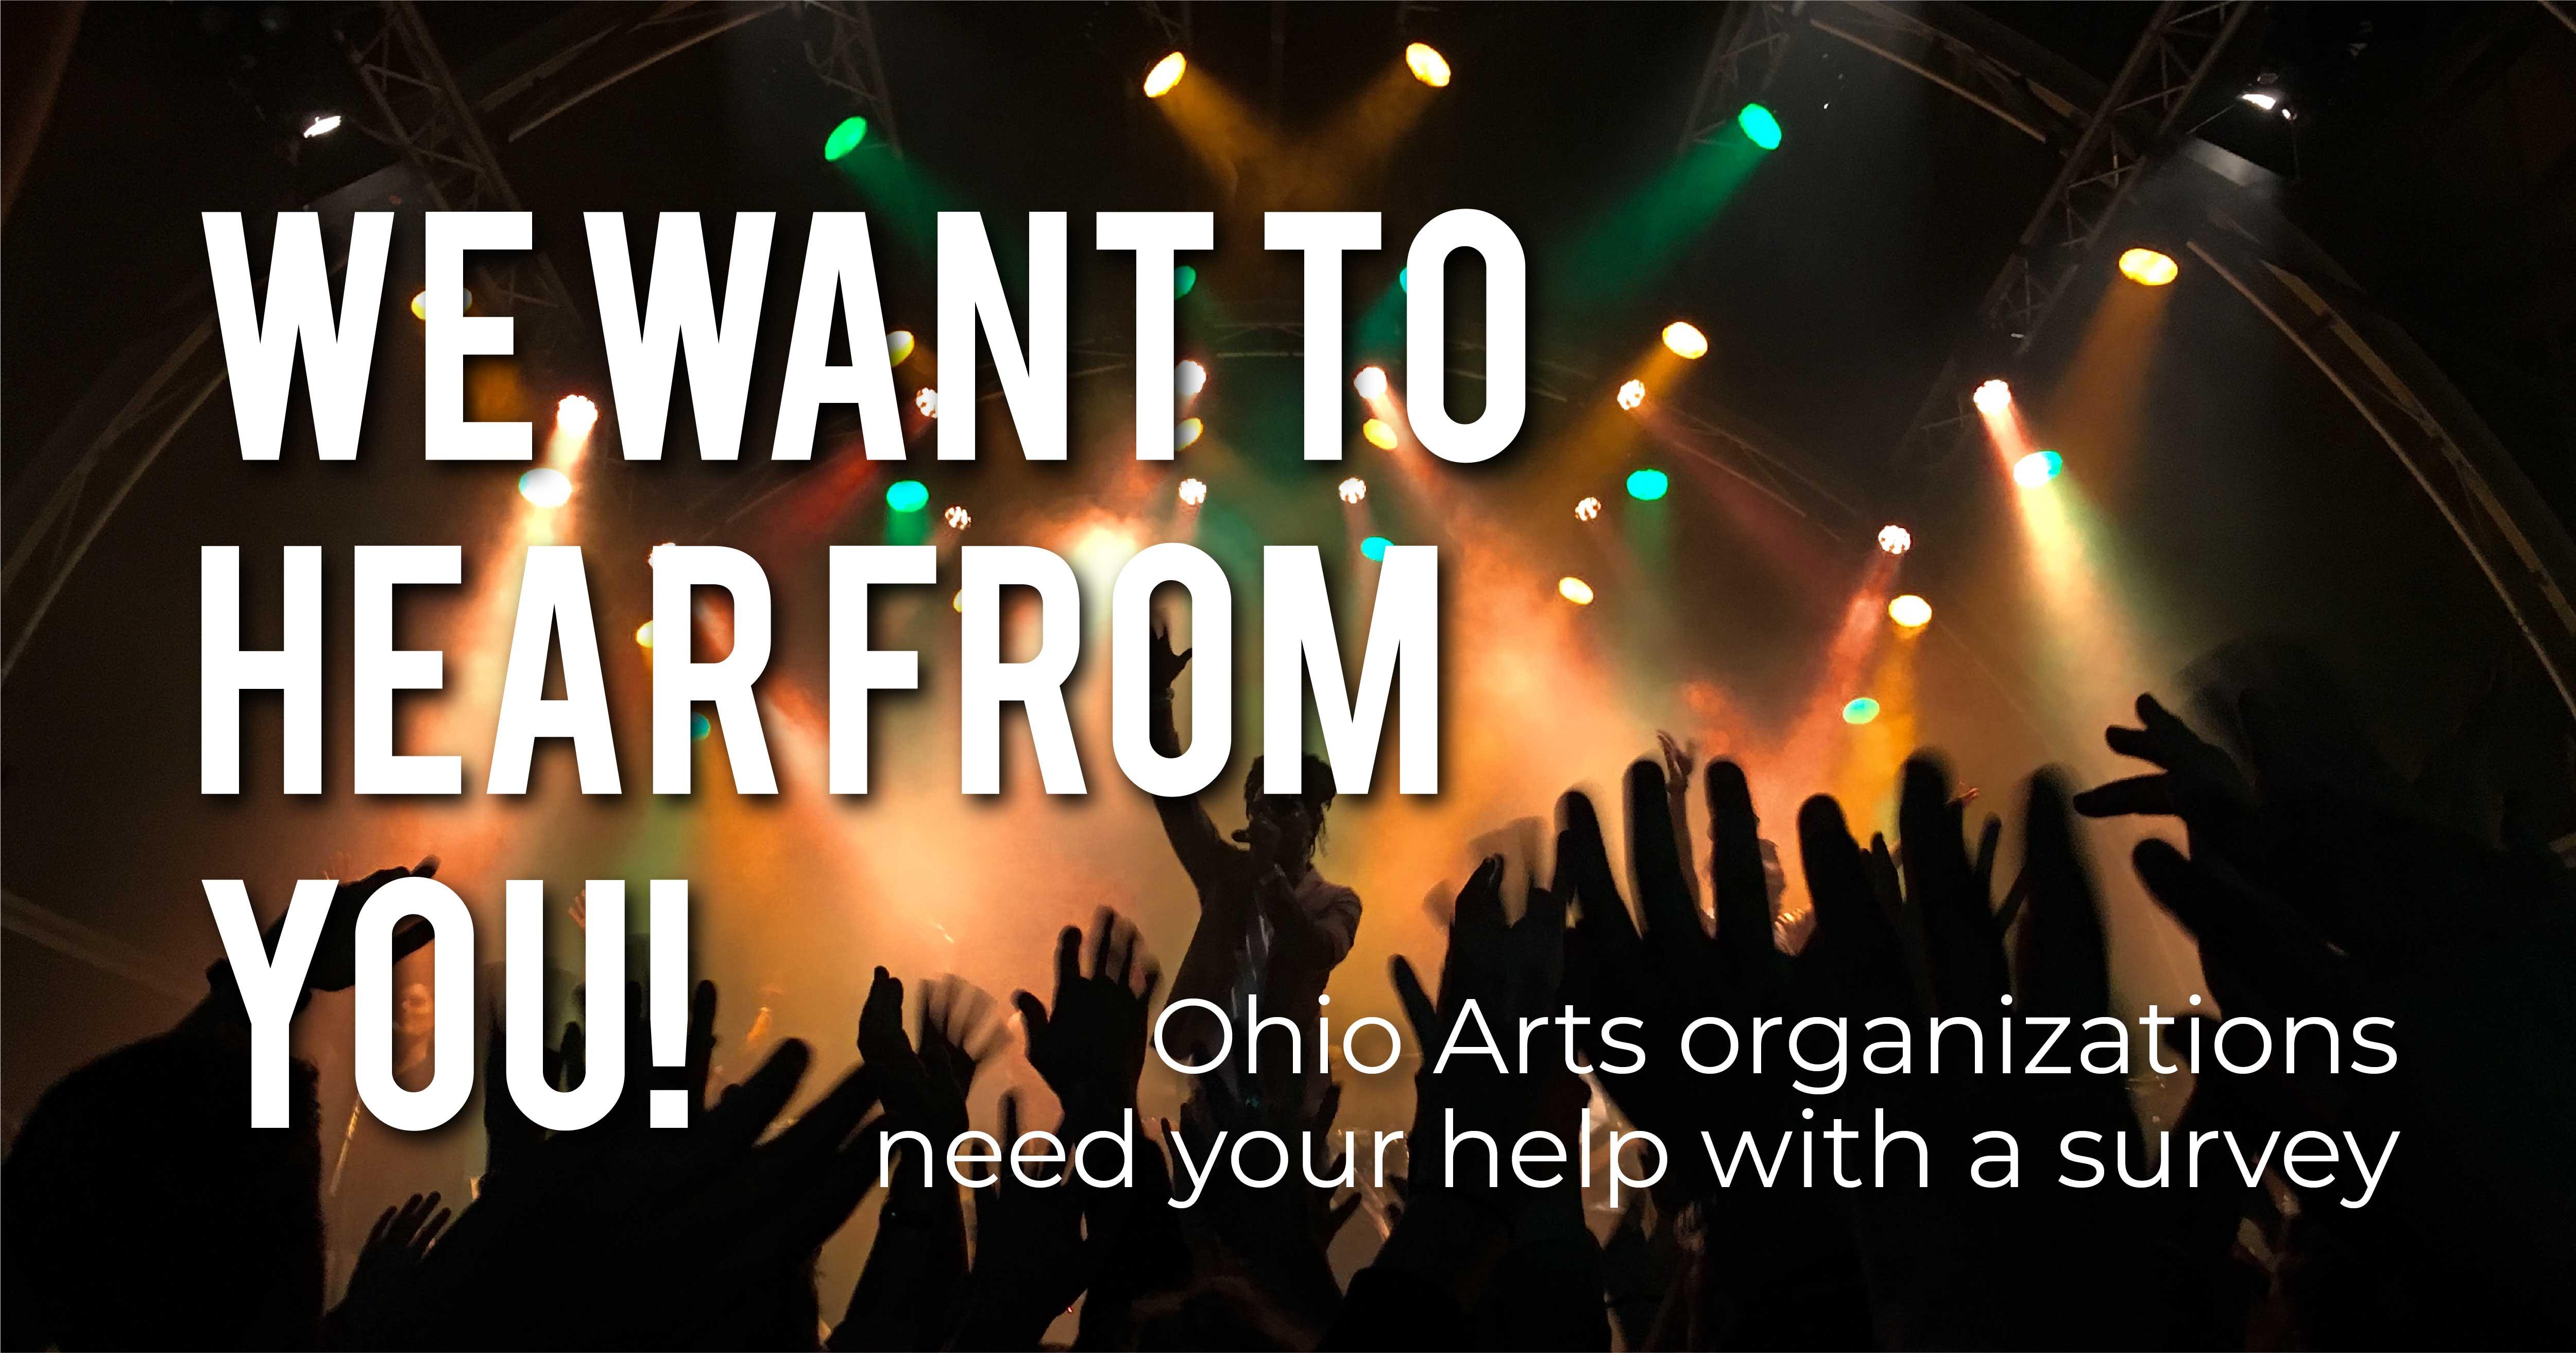 OhioArtsSurveyGraphics-FacebookTwitter_Concert.jpg